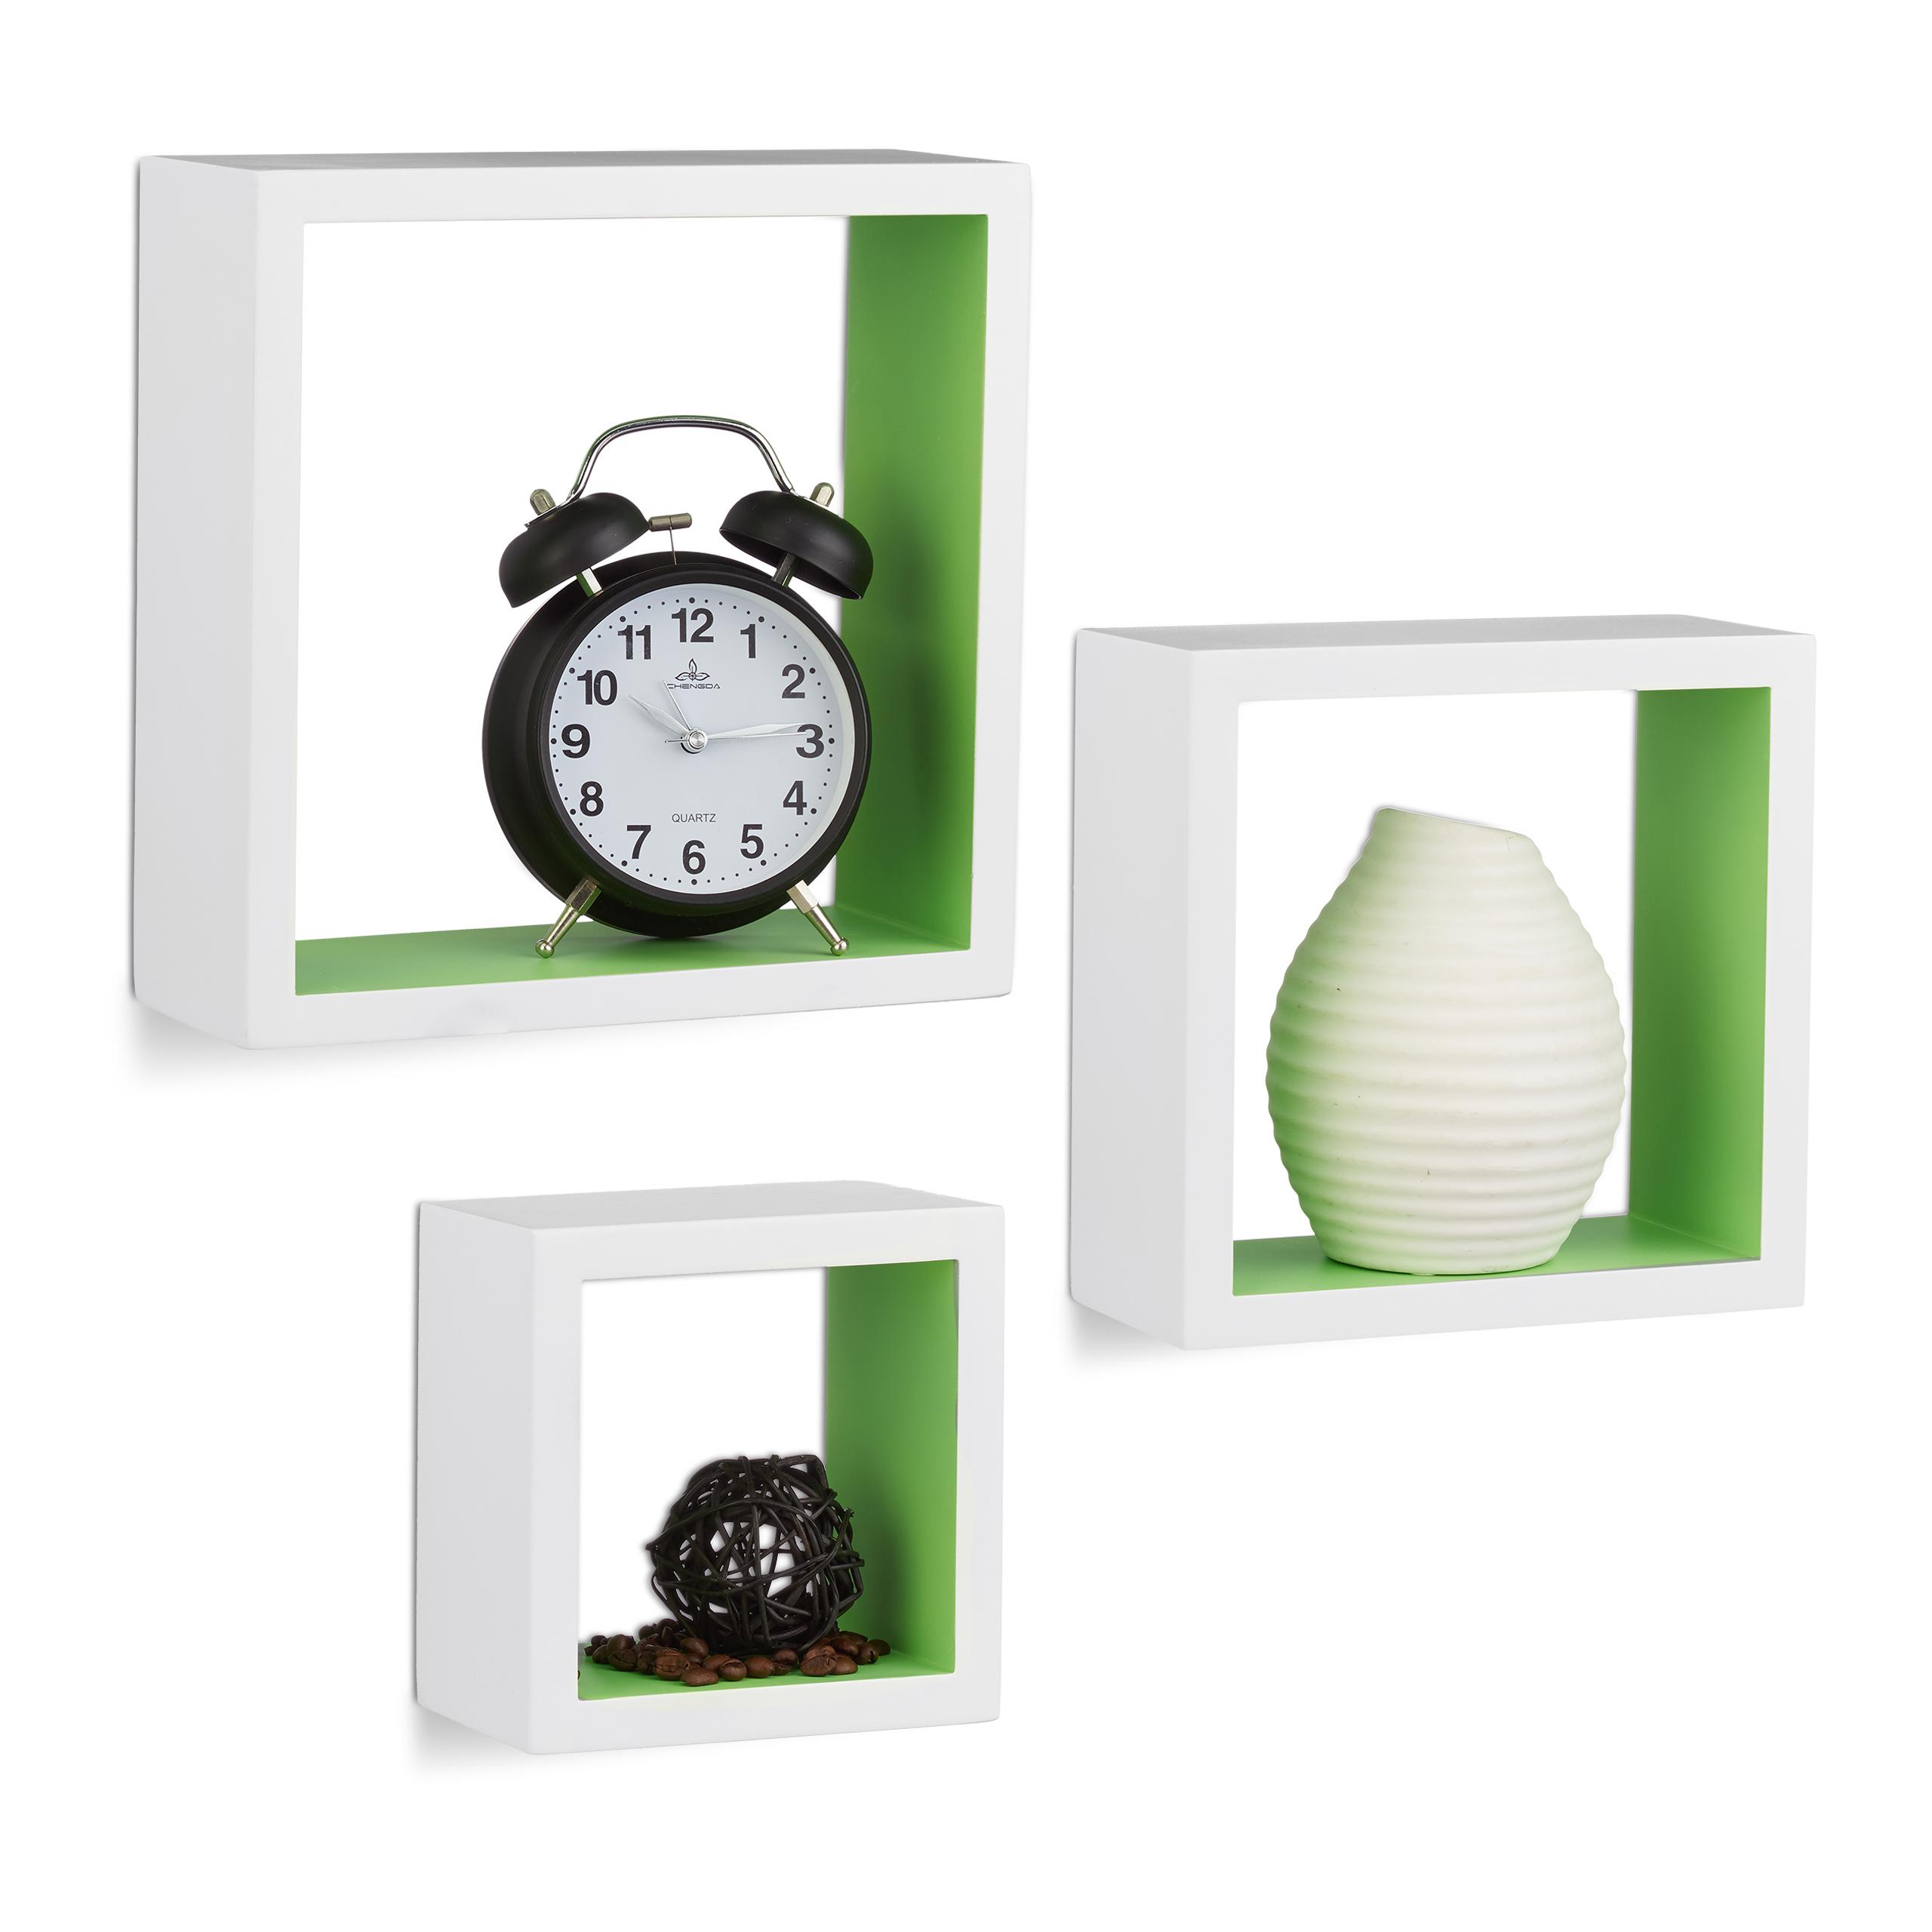 Square-Wall-Shelves-Set-of-3-Cube-Shelf-MDF-Bookcase-Wooden-Floating-Shelf